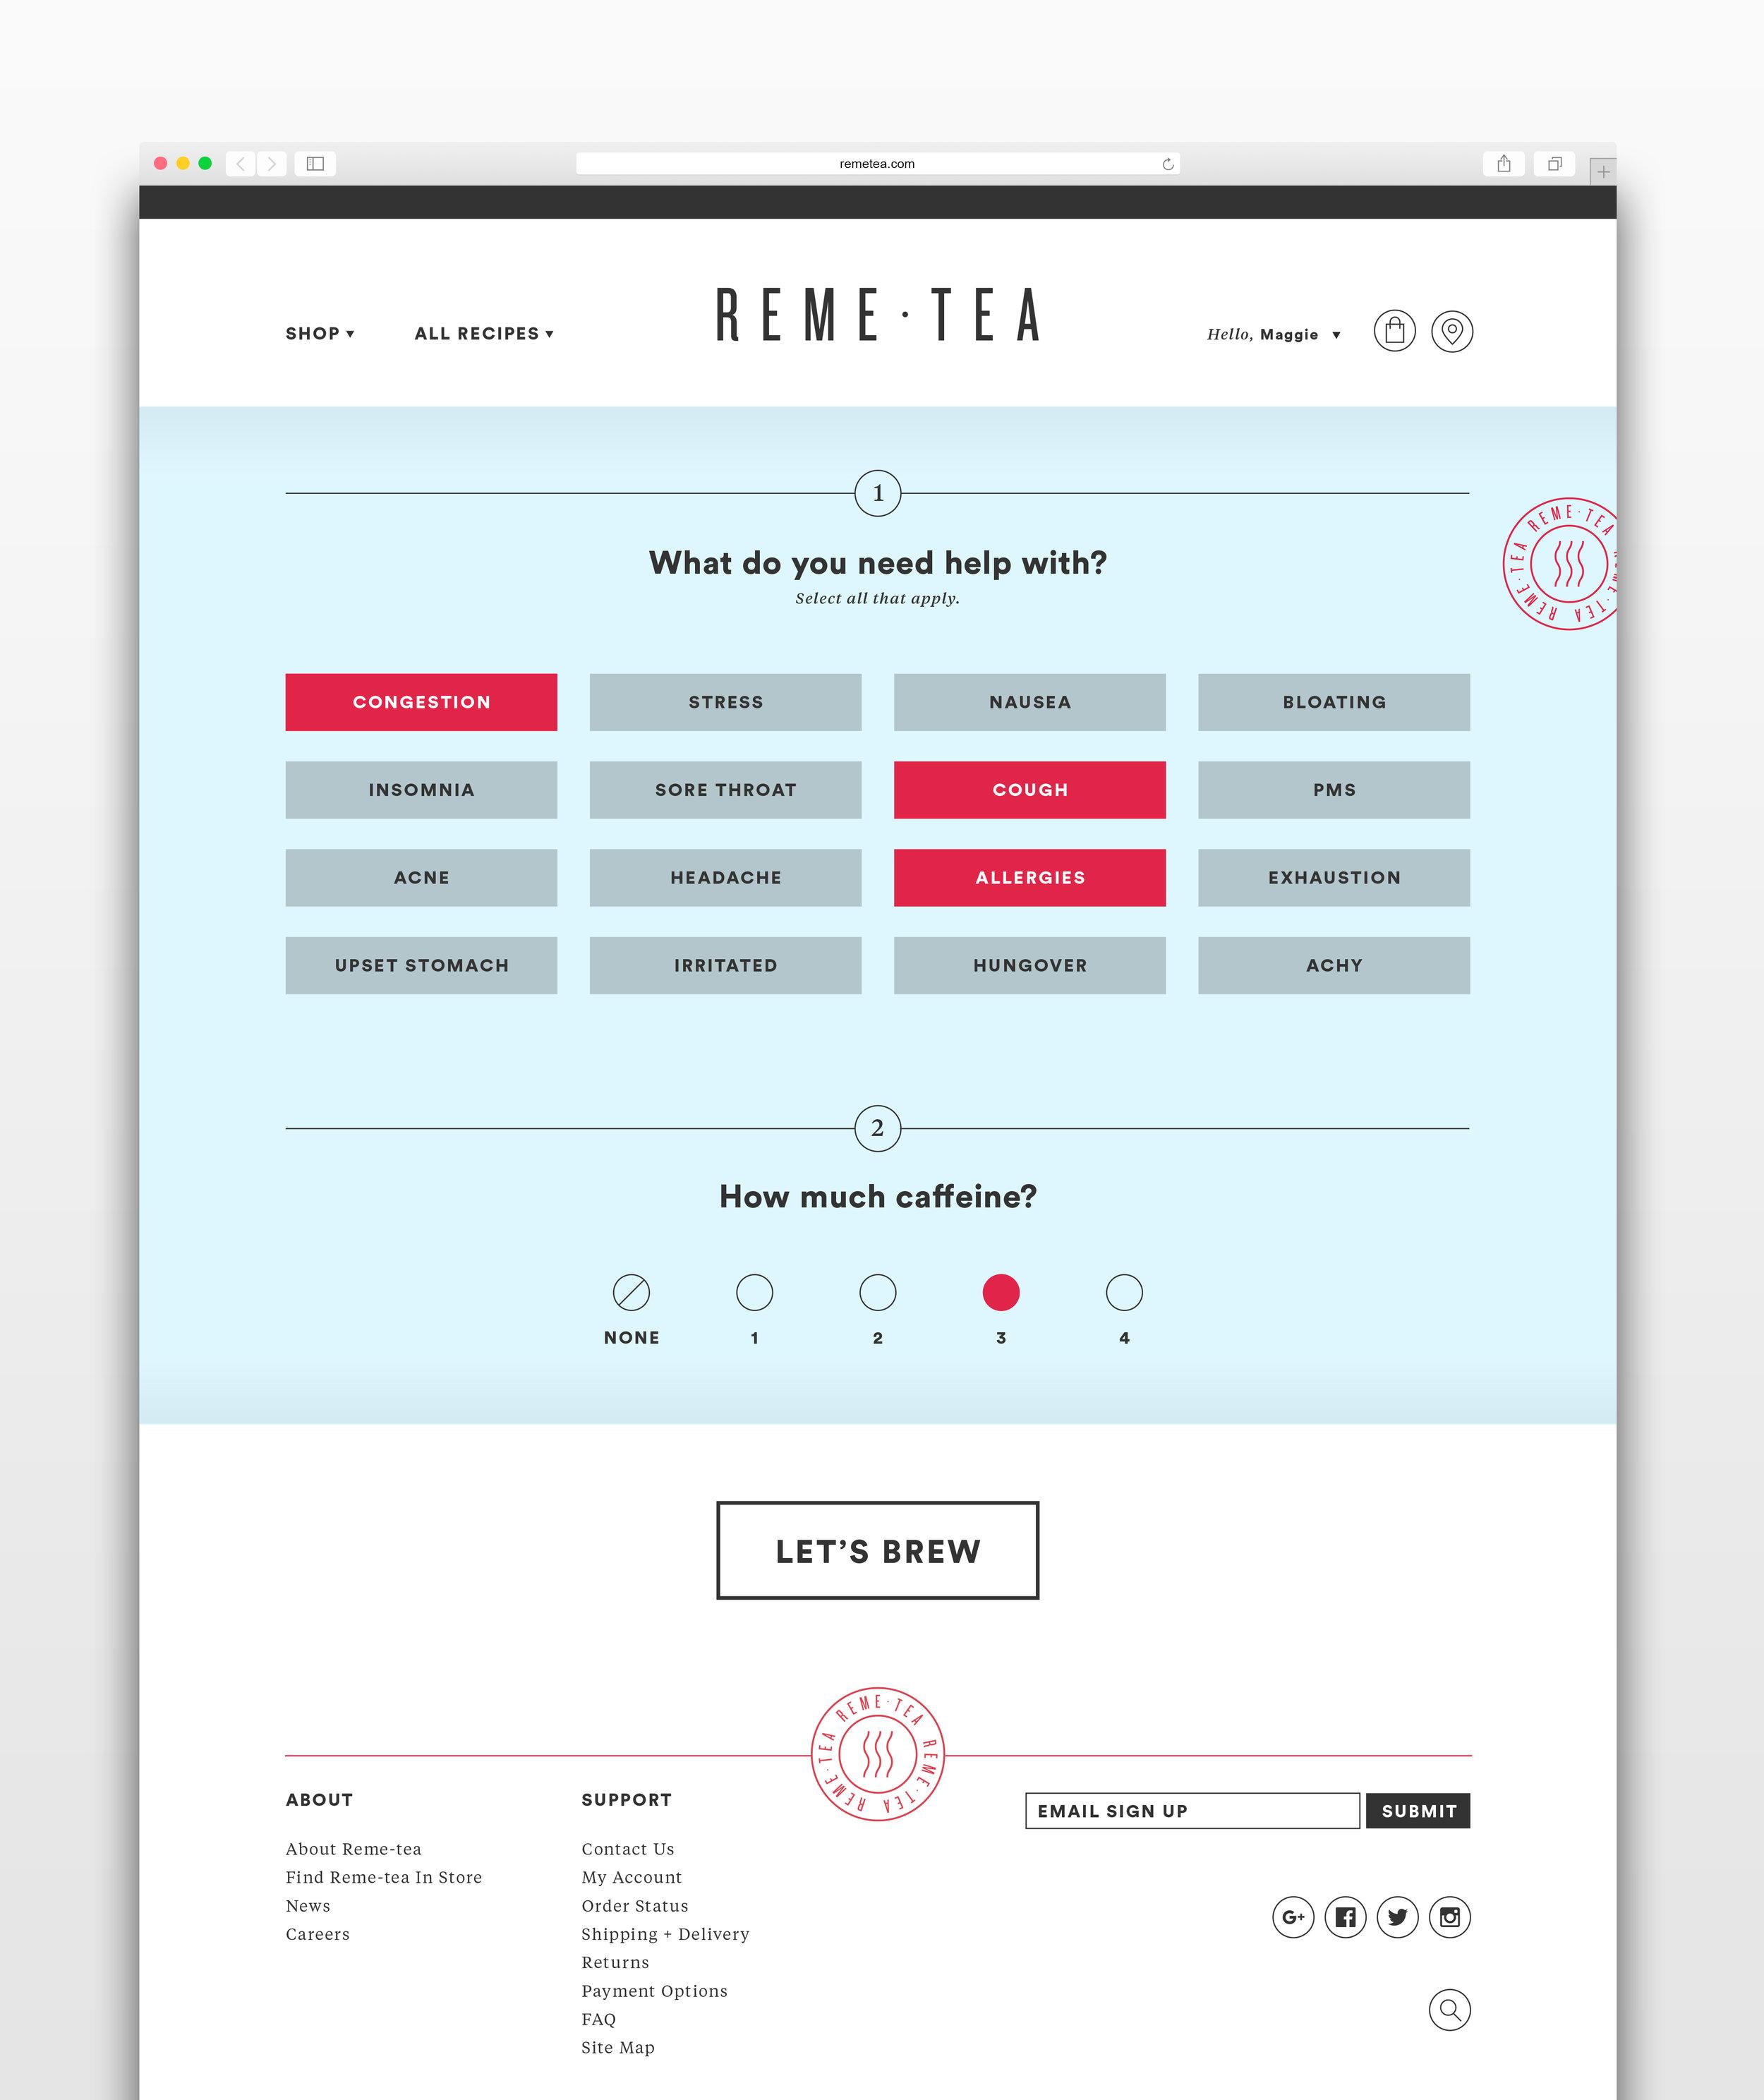 Remetea_Website_Mockup_1.jpg